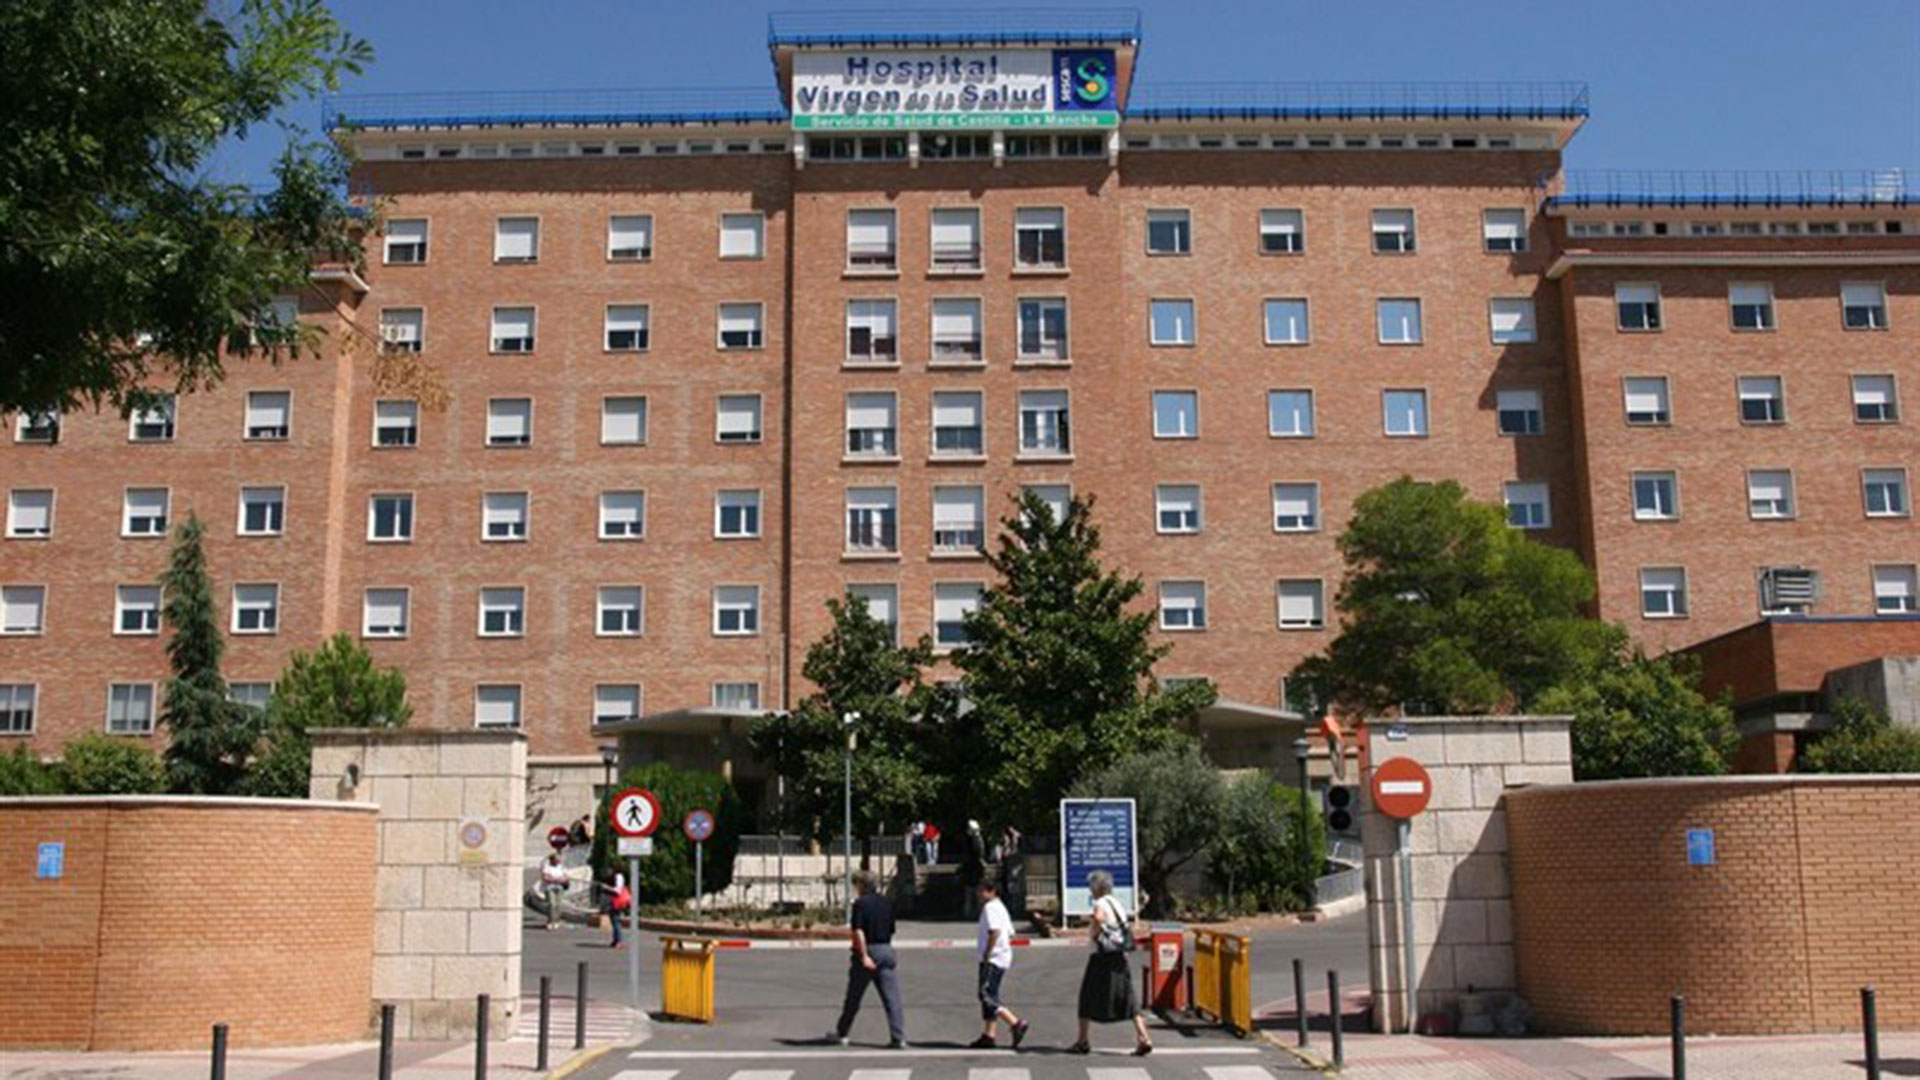 Hospital Virgebn de la Salud